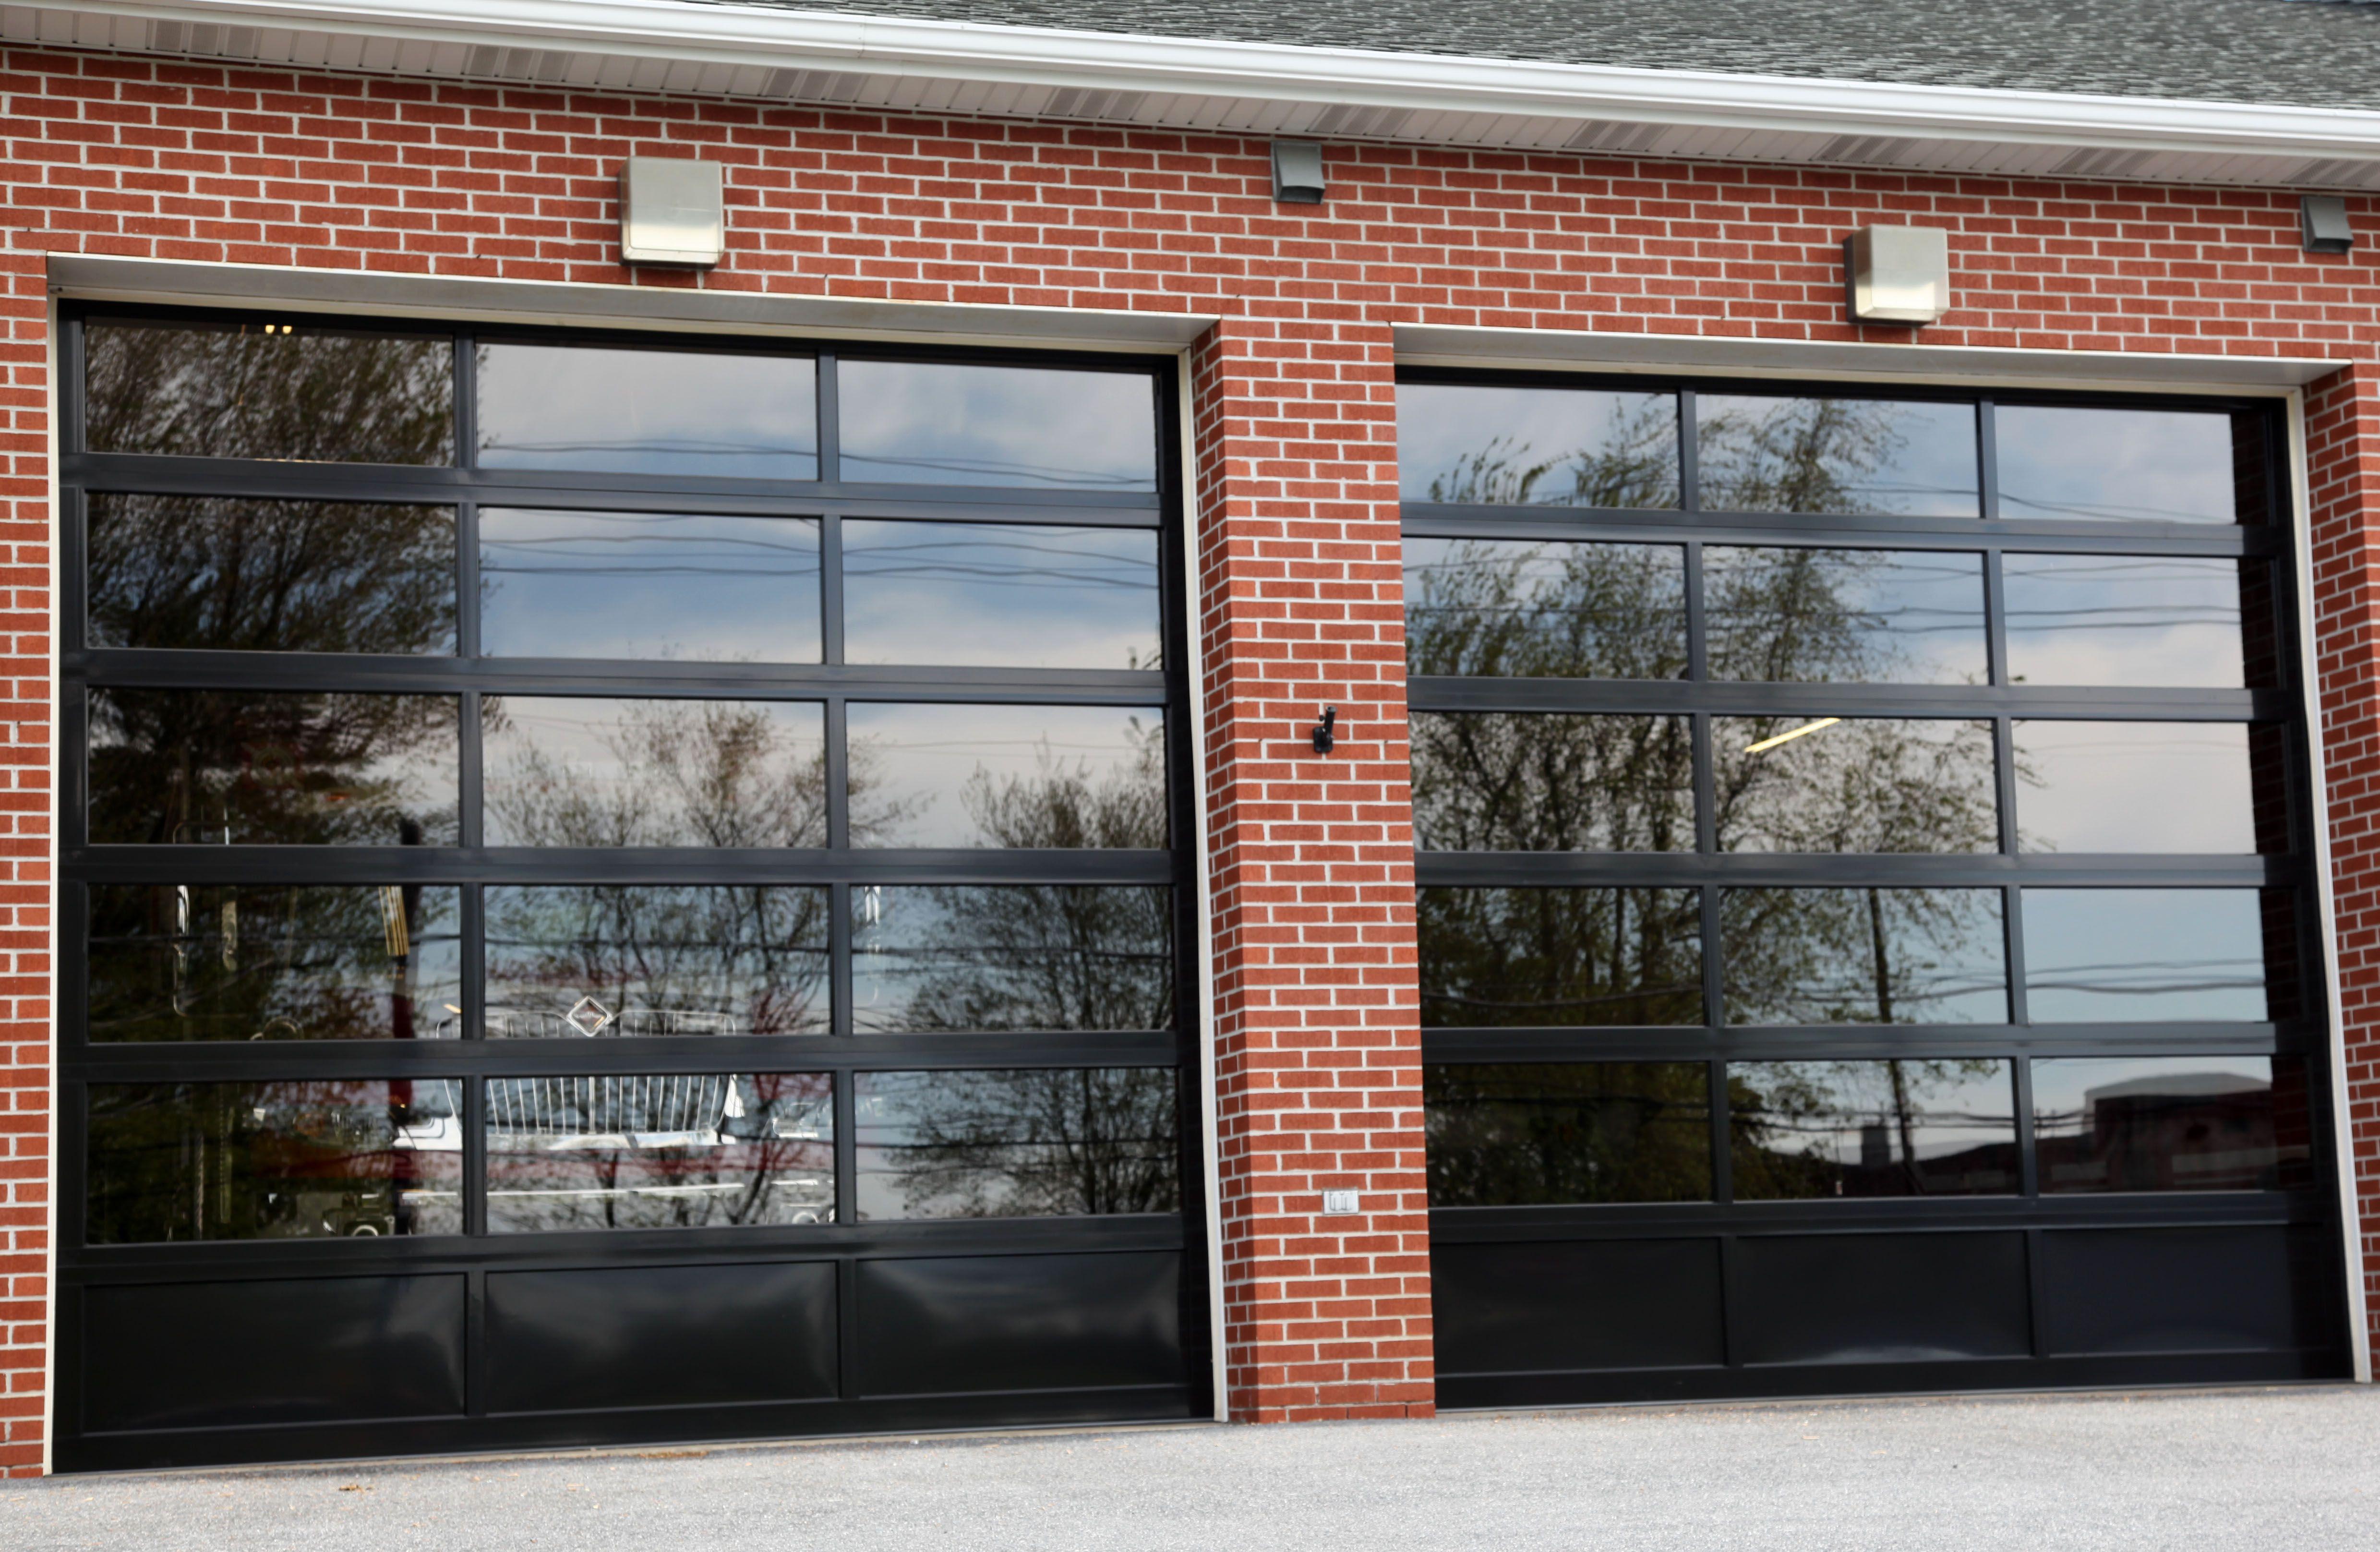 Commercial Doors For Fire Dept Aluminium Garage Doors Garage Doors Commercial Garage Doors